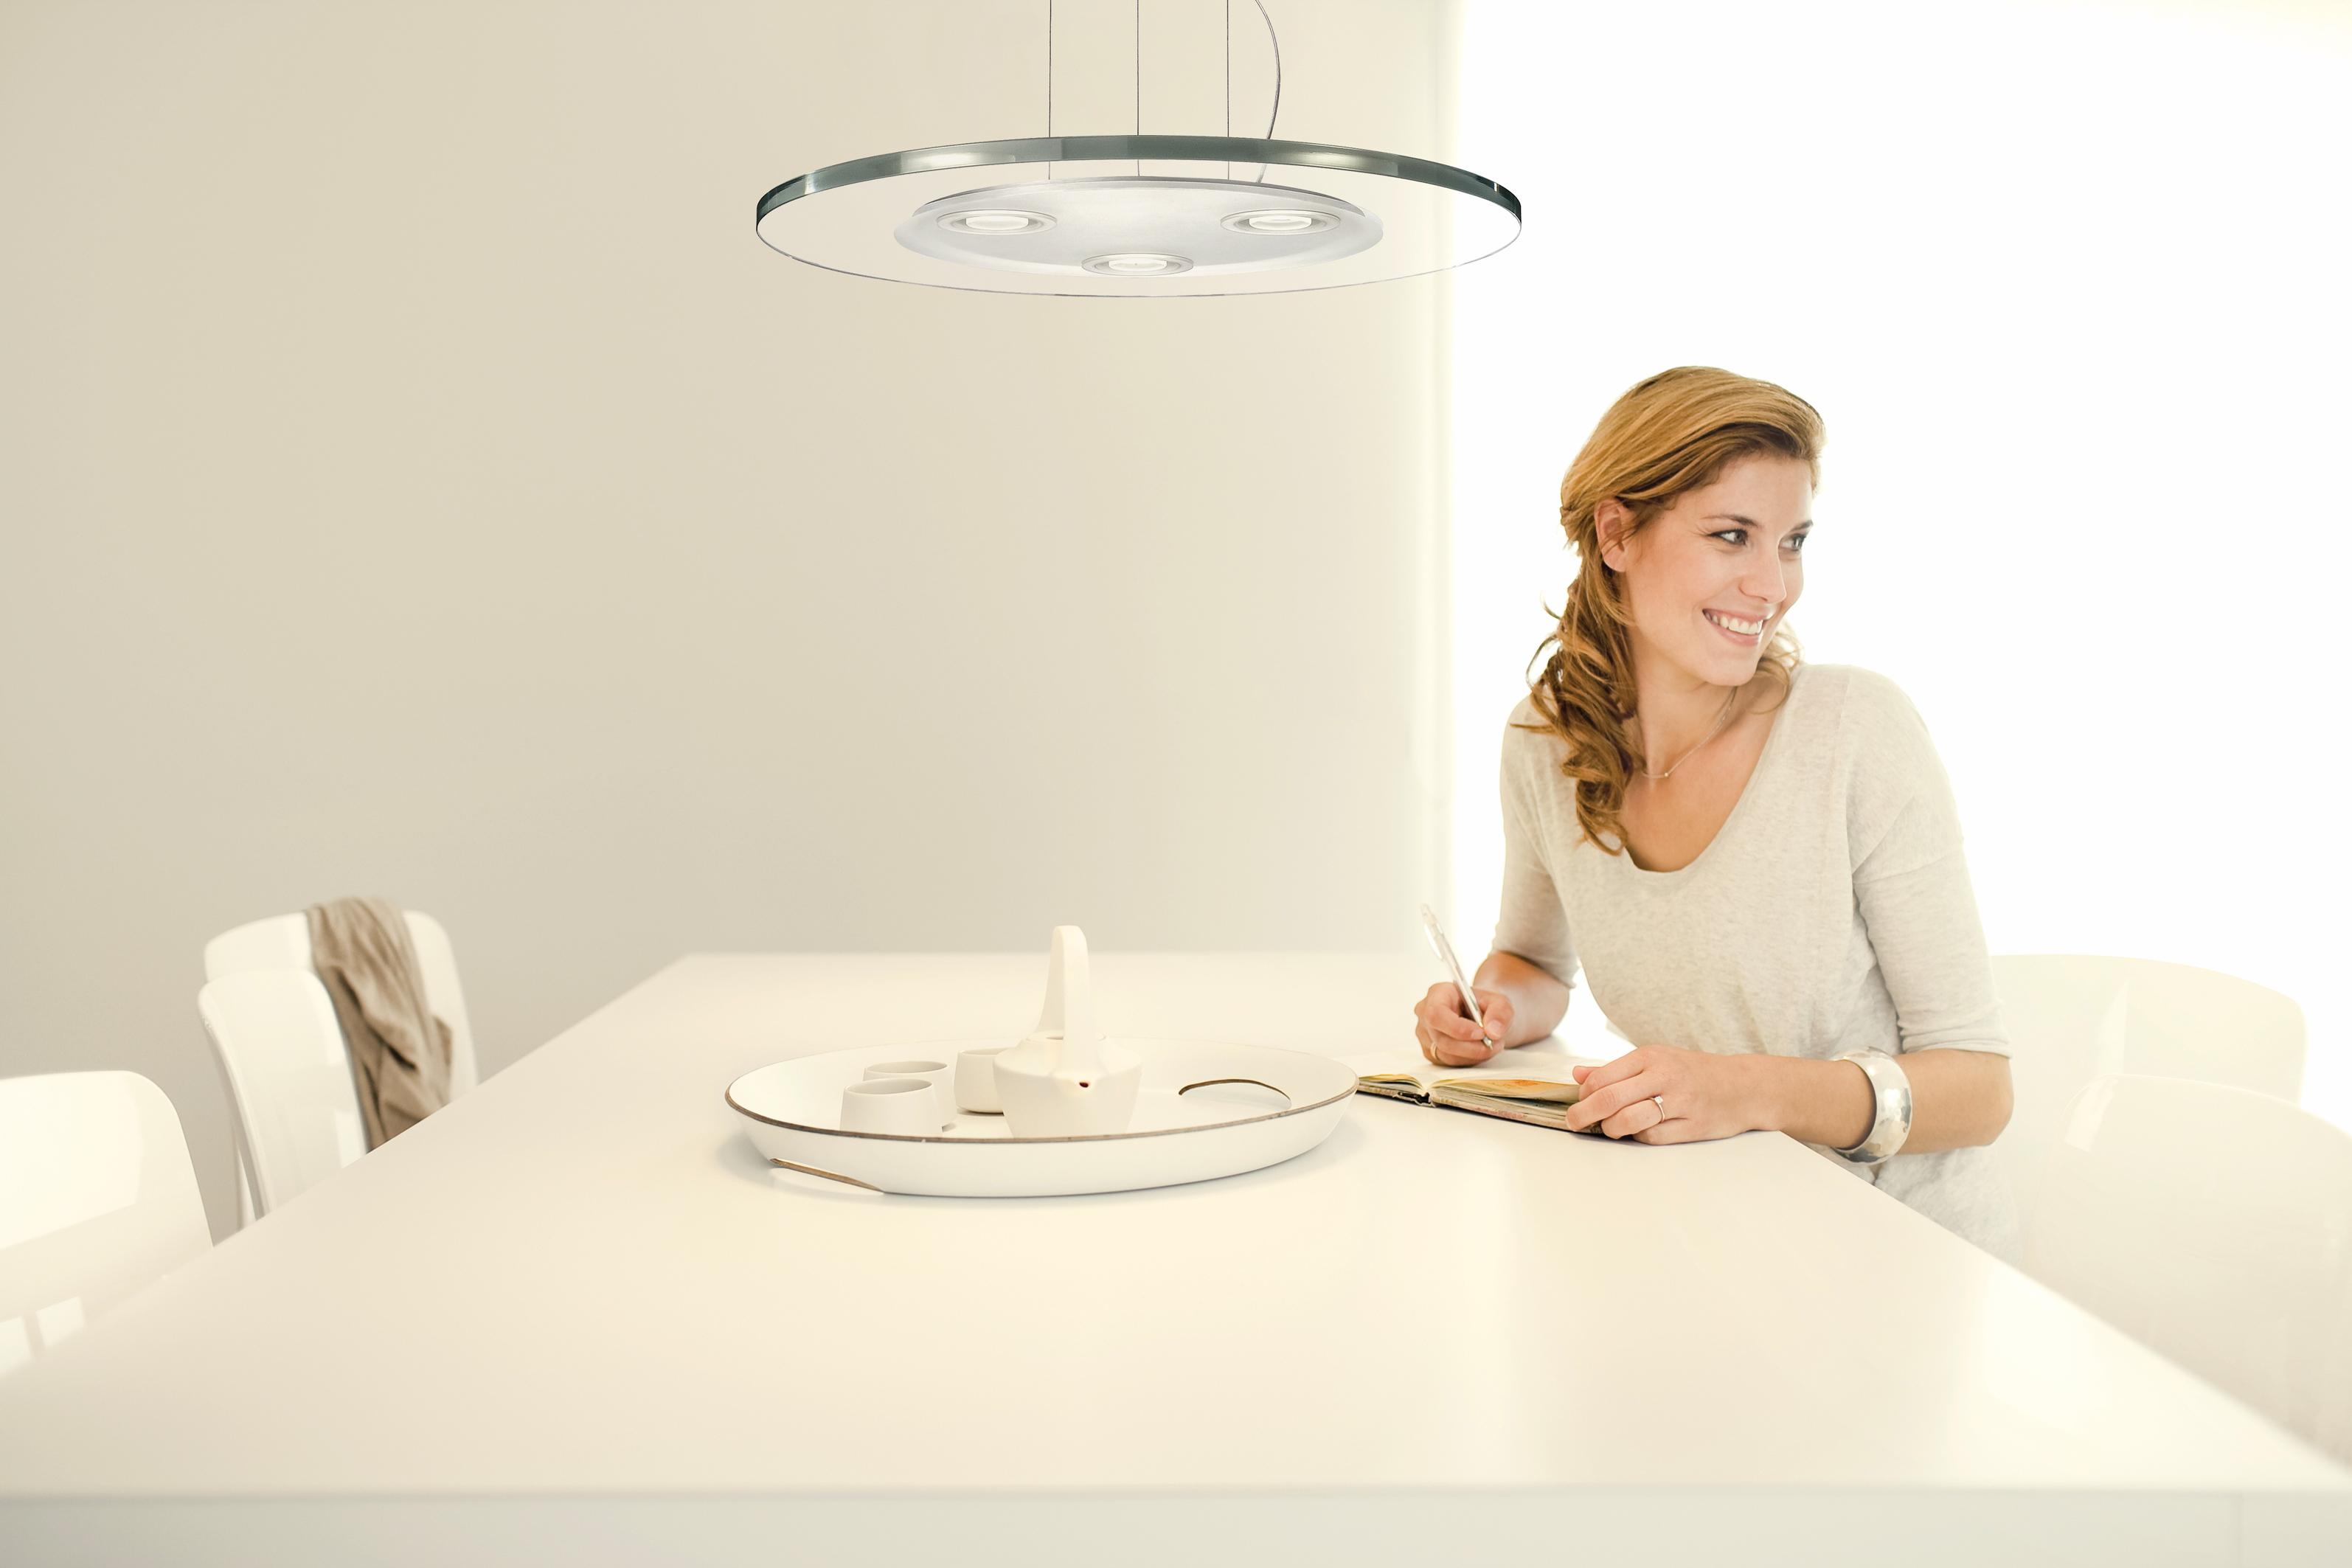 Led Lampen Folie : Dimmer voor led lampen gamma led lampen dimmen wohndesign idee